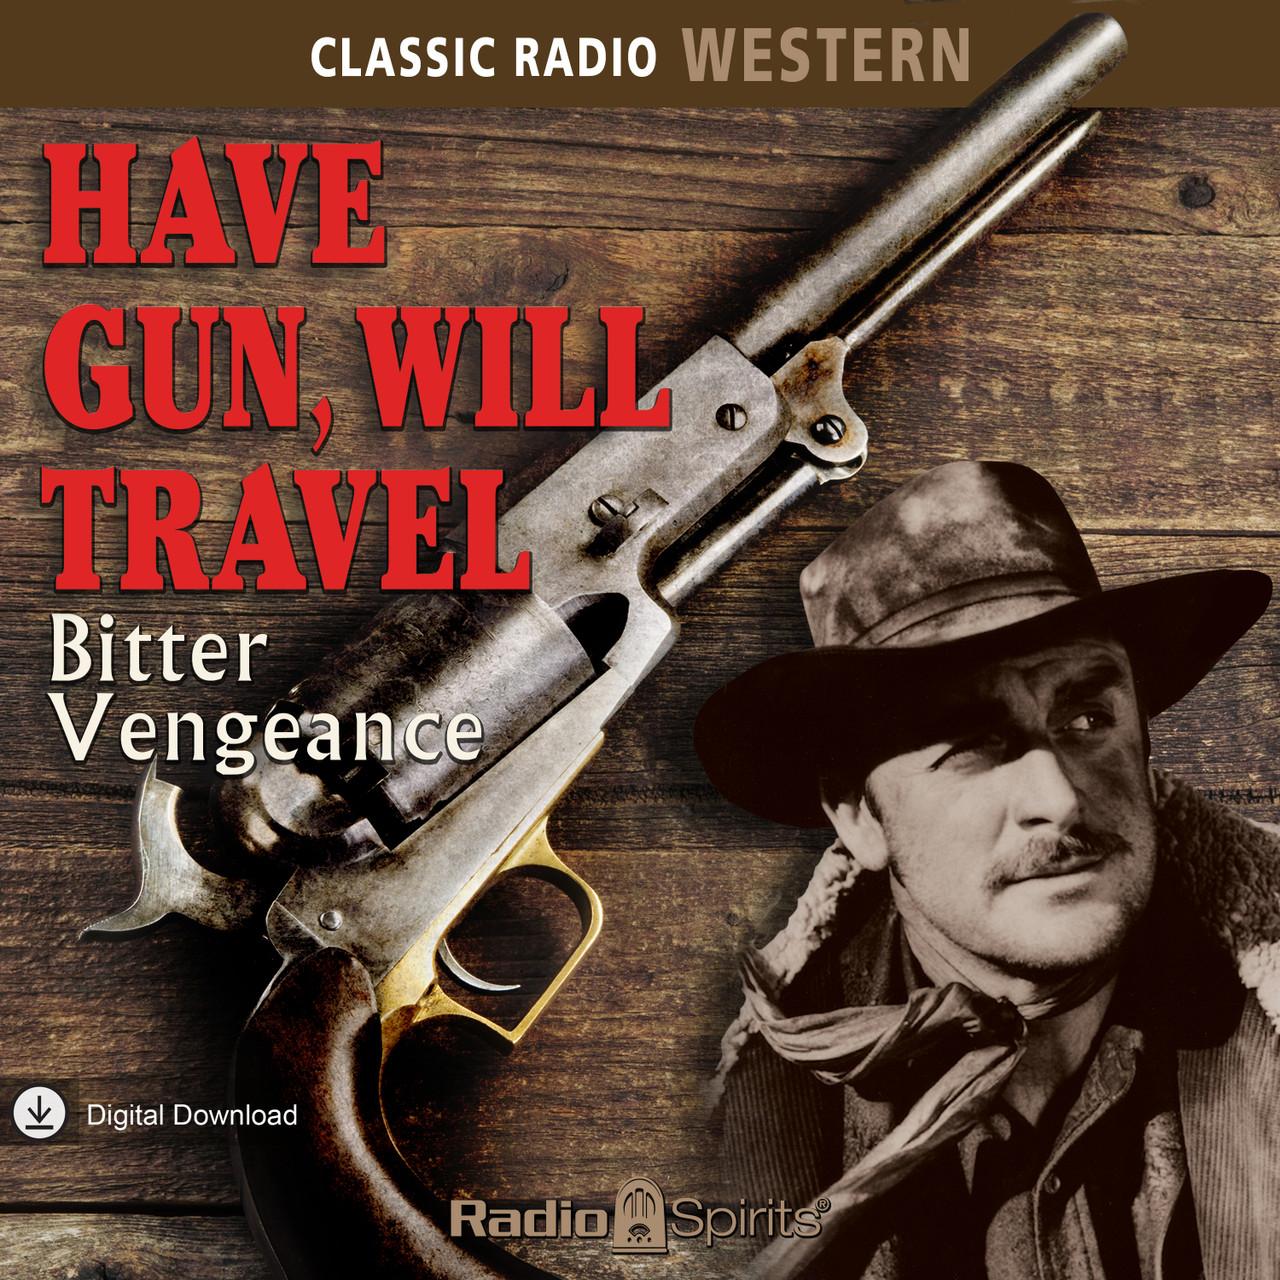 Have Gun Will Travel: Bitter Vengeance (MP3 Download)